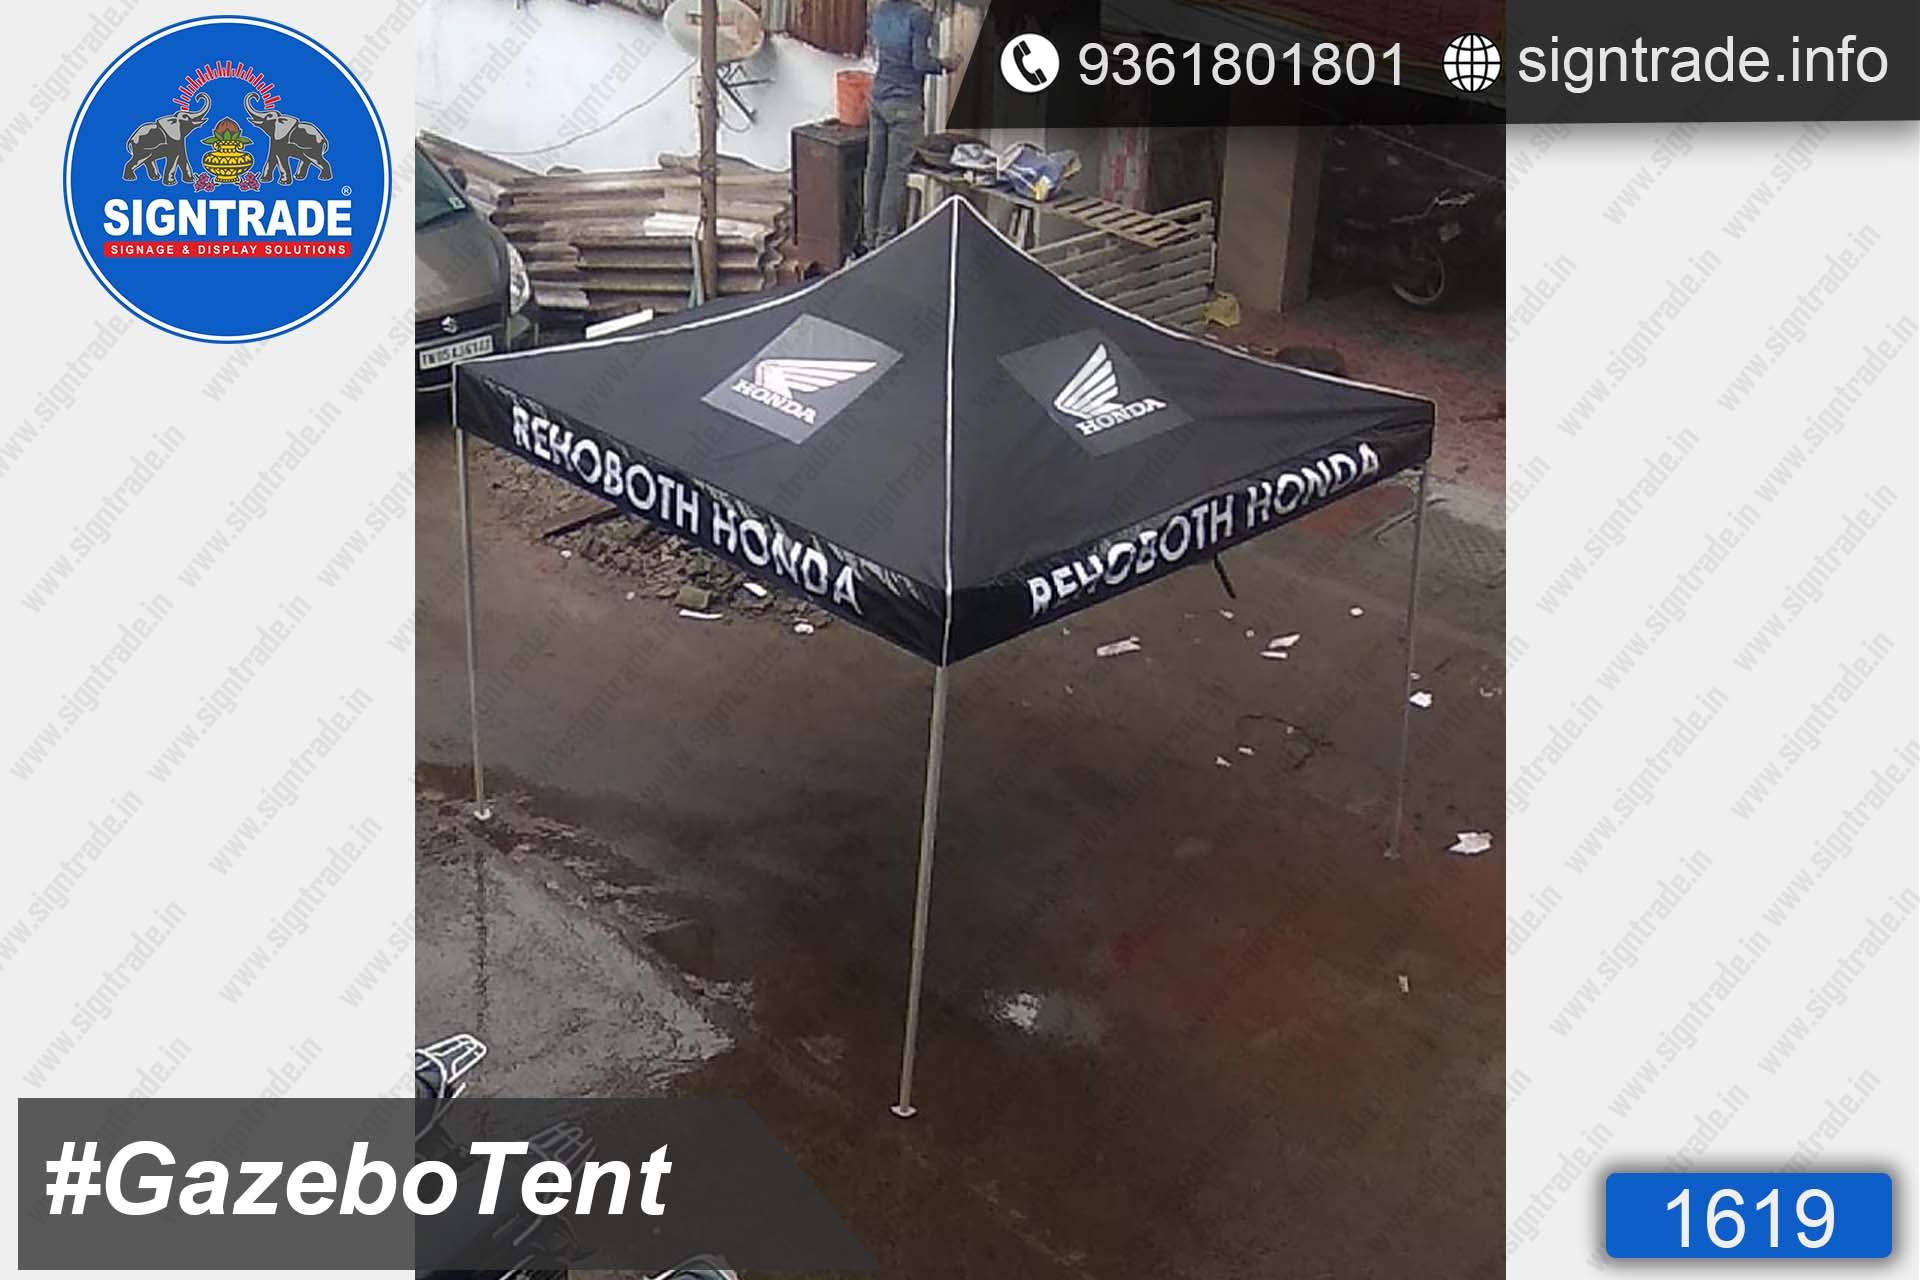 Rehoboth Honda - Gazebo Tent - SIGNTRADE - Promotional Gazebo Tent Manufacturers in Chennai